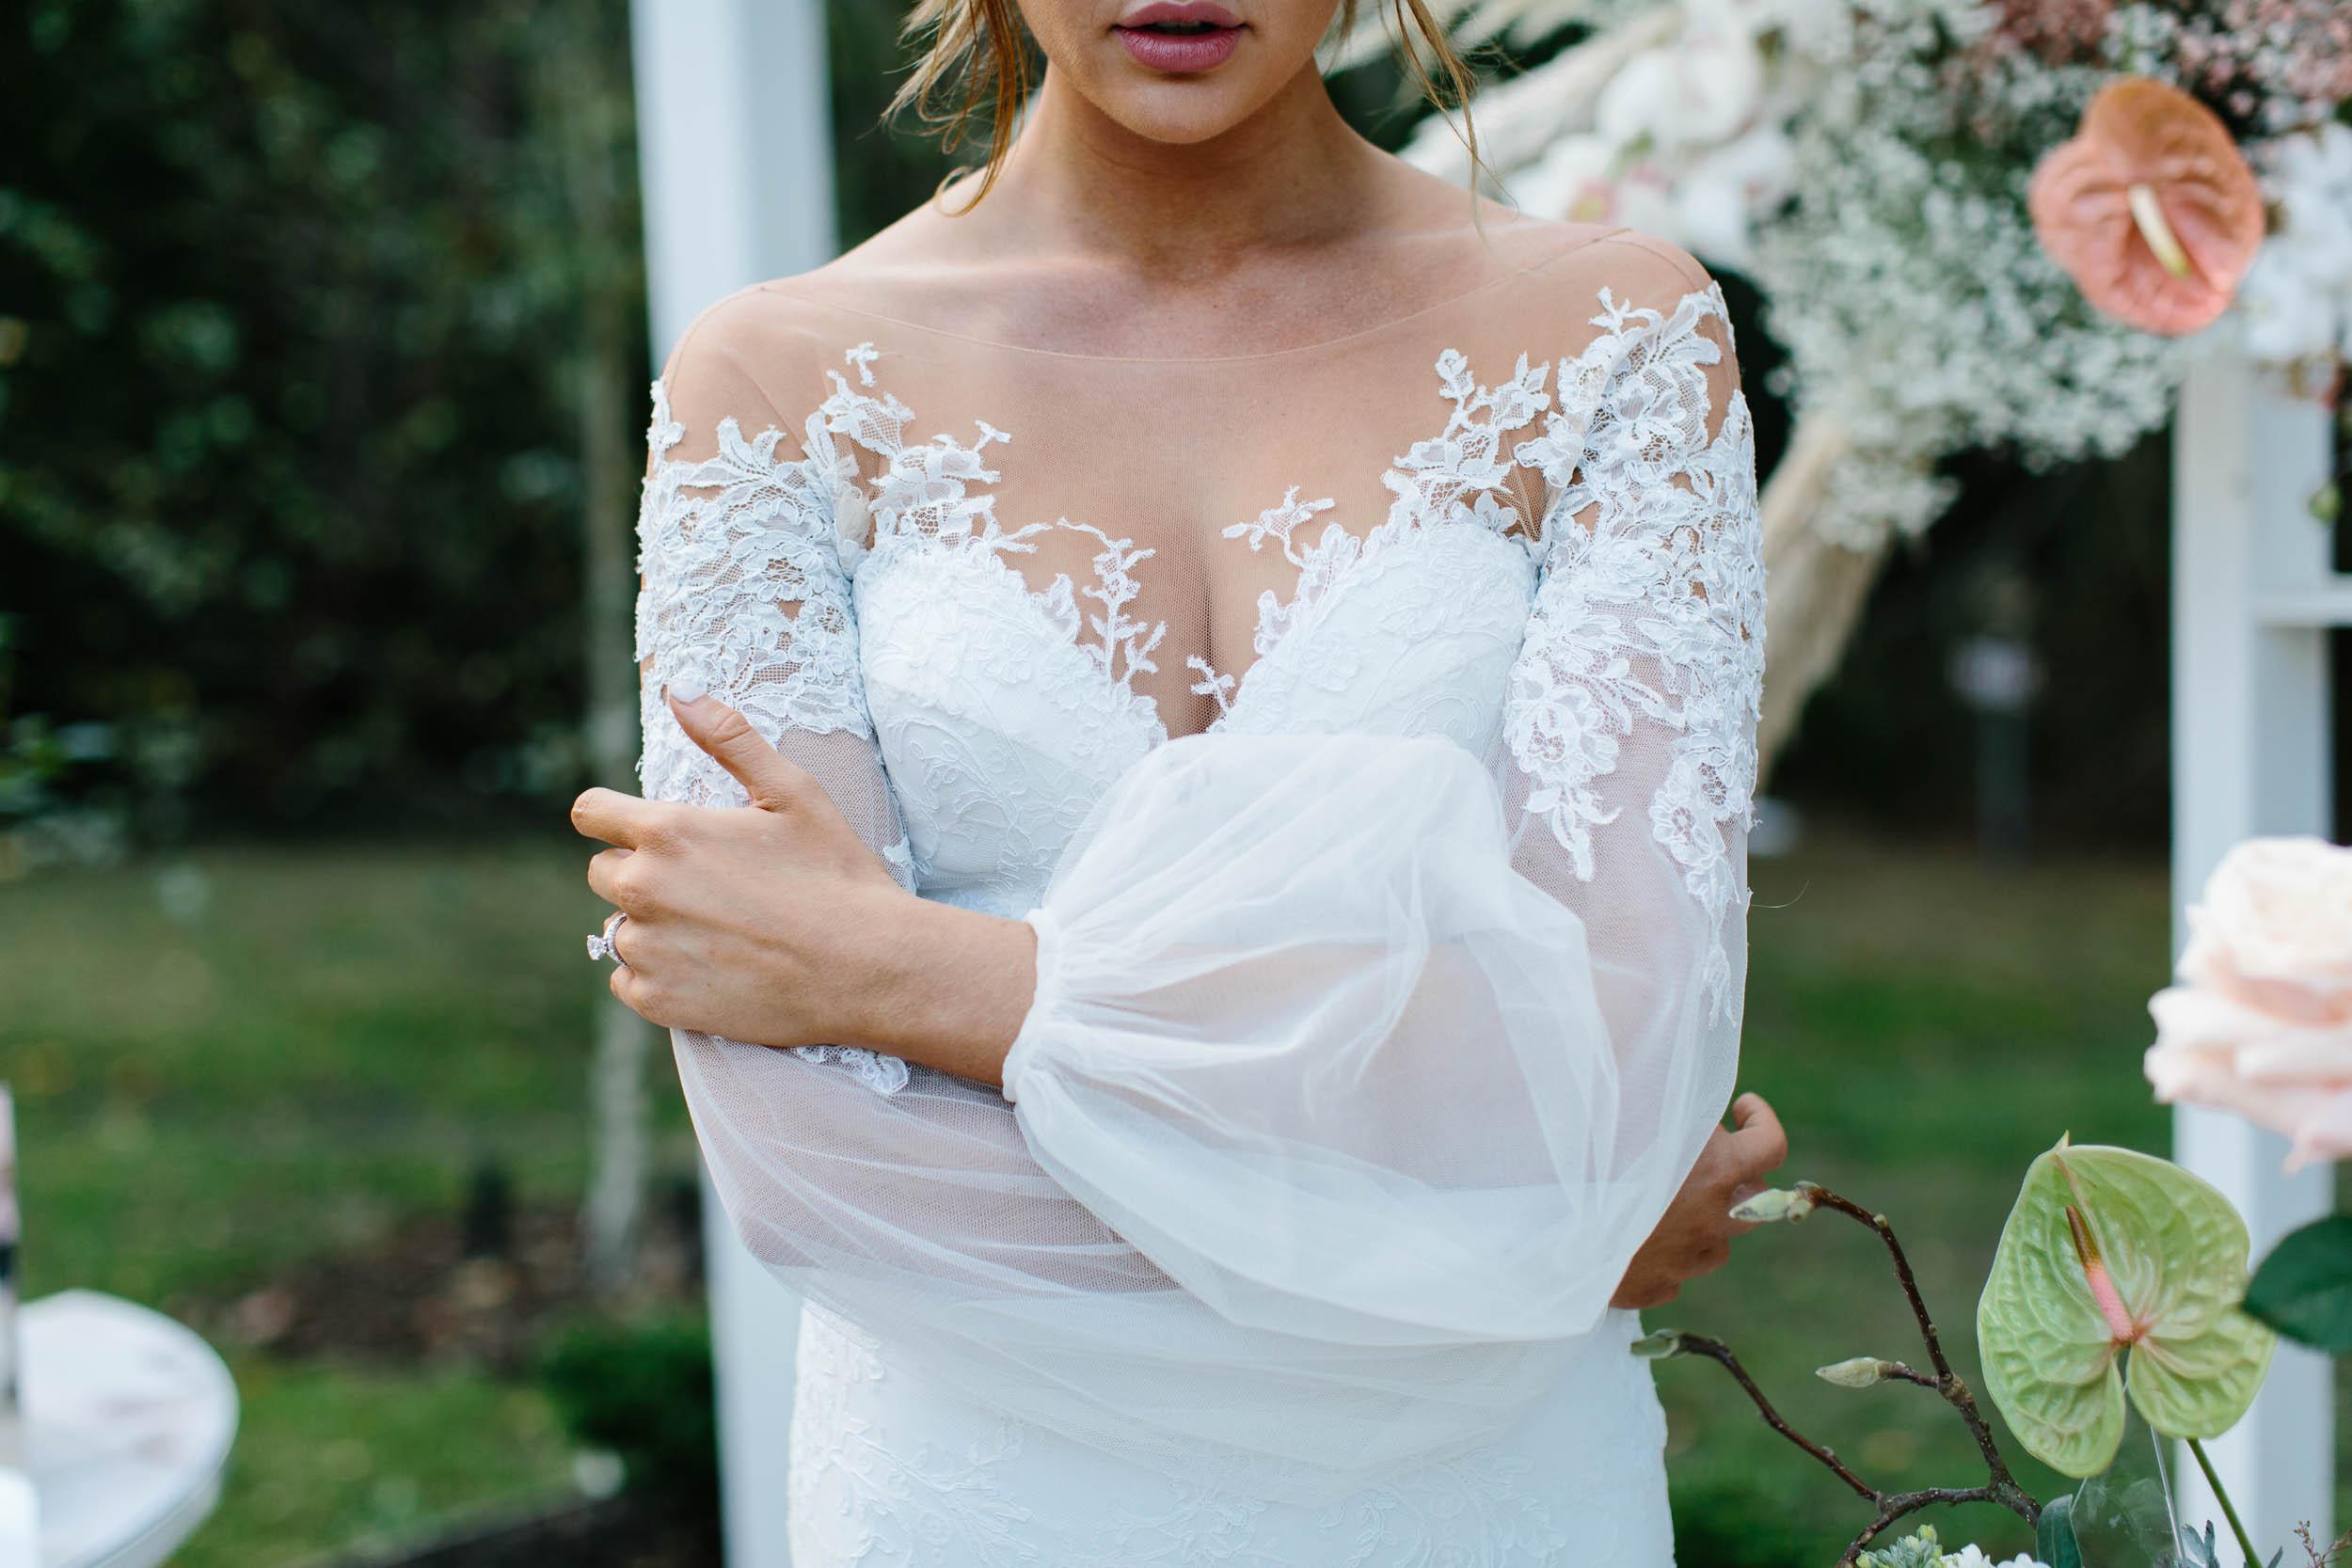 Kas-Richards-LENZO-Yarra-Valley-Wedding-One-Day-Bridal-191.jpg